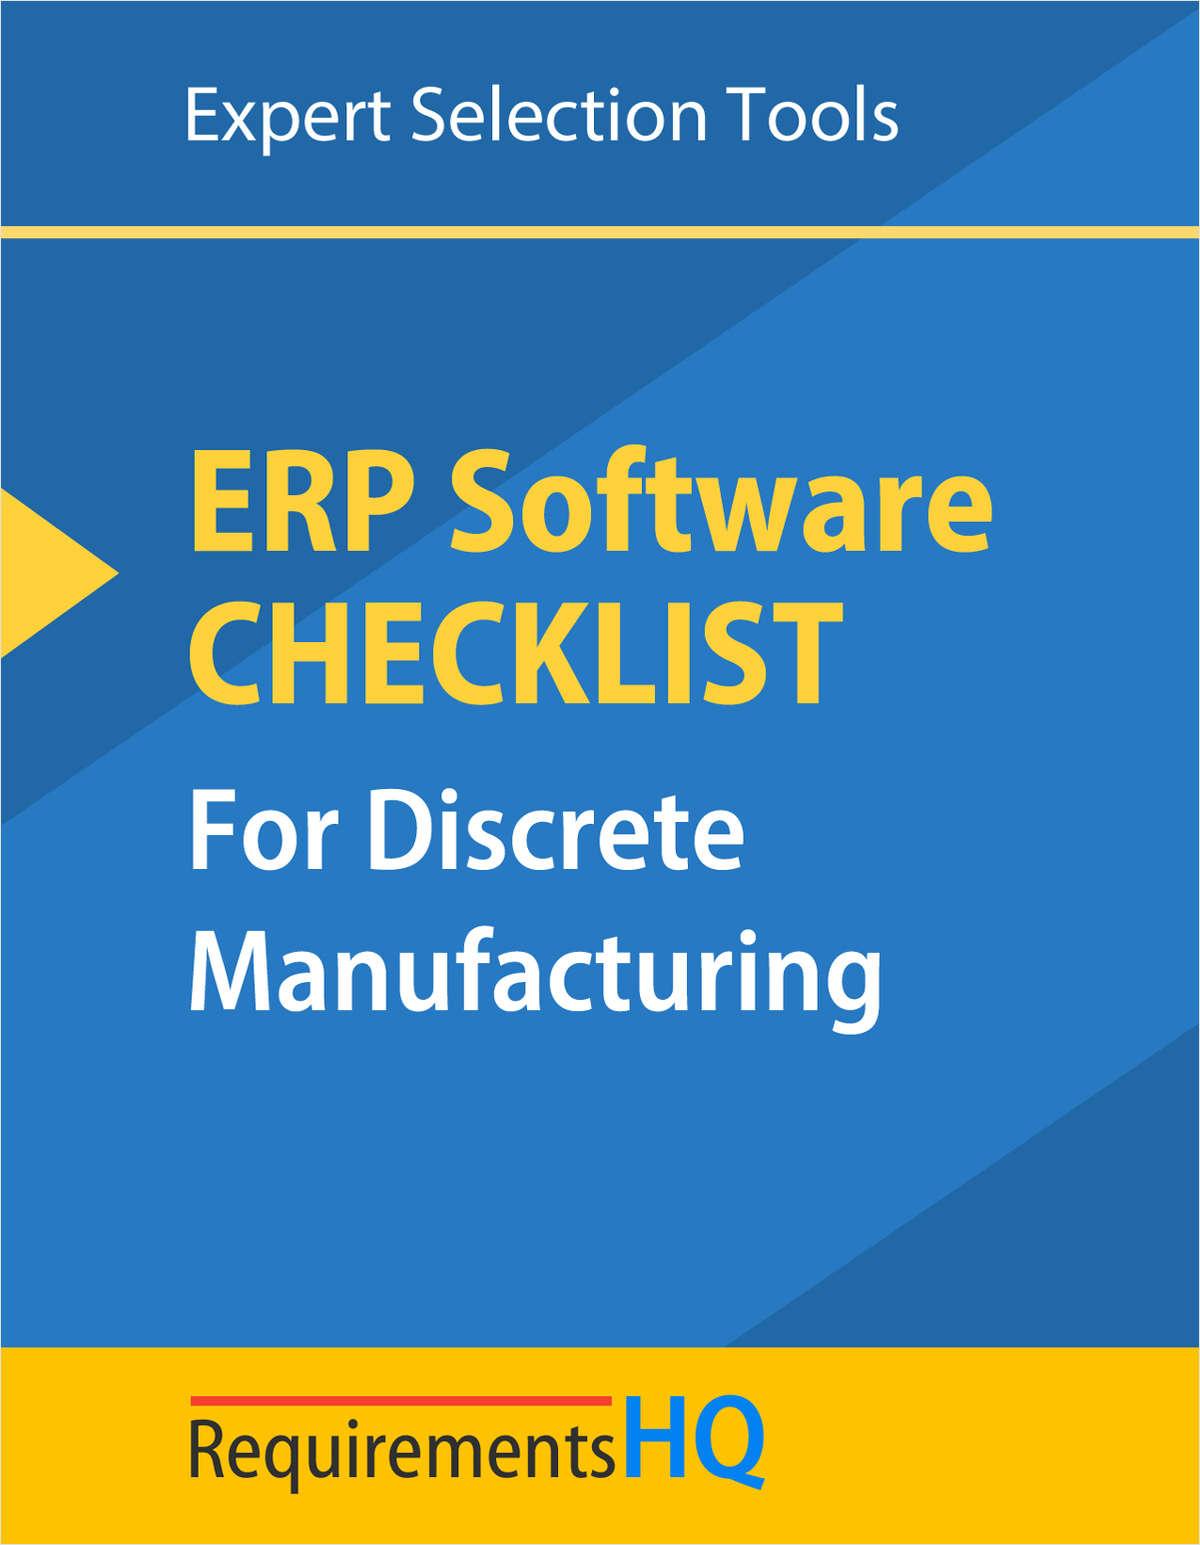 ERP Requirements Checklist for Discrete Manufacturers